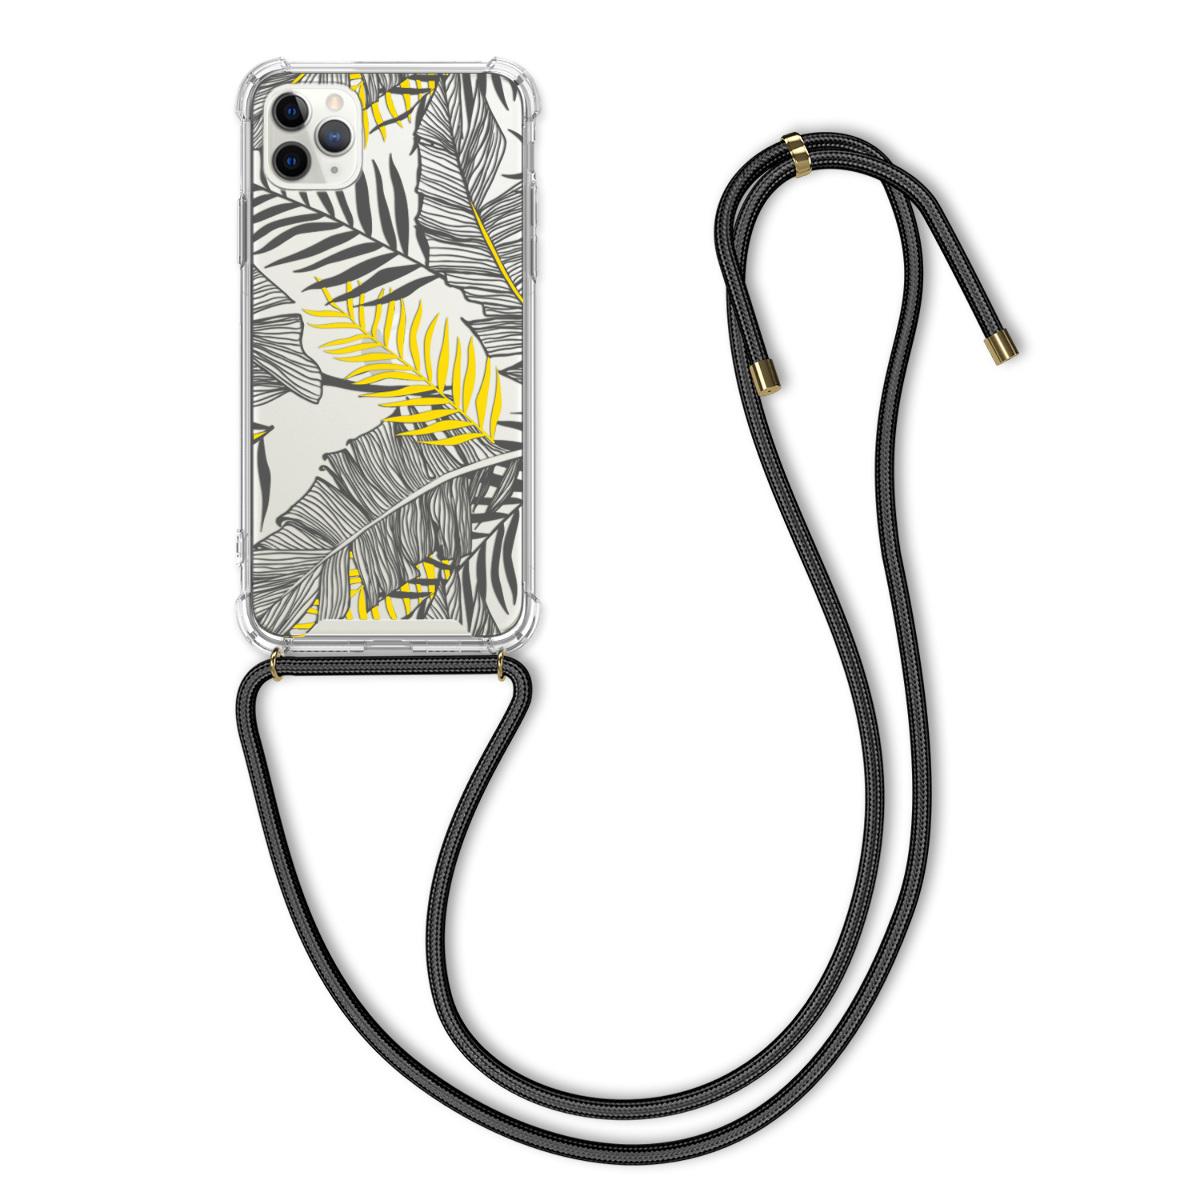 Kvalitní silikonové TPU pouzdro pro Apple iPhone 11 Pro Max - Palm Leaves Yellow | Grey | Transparent